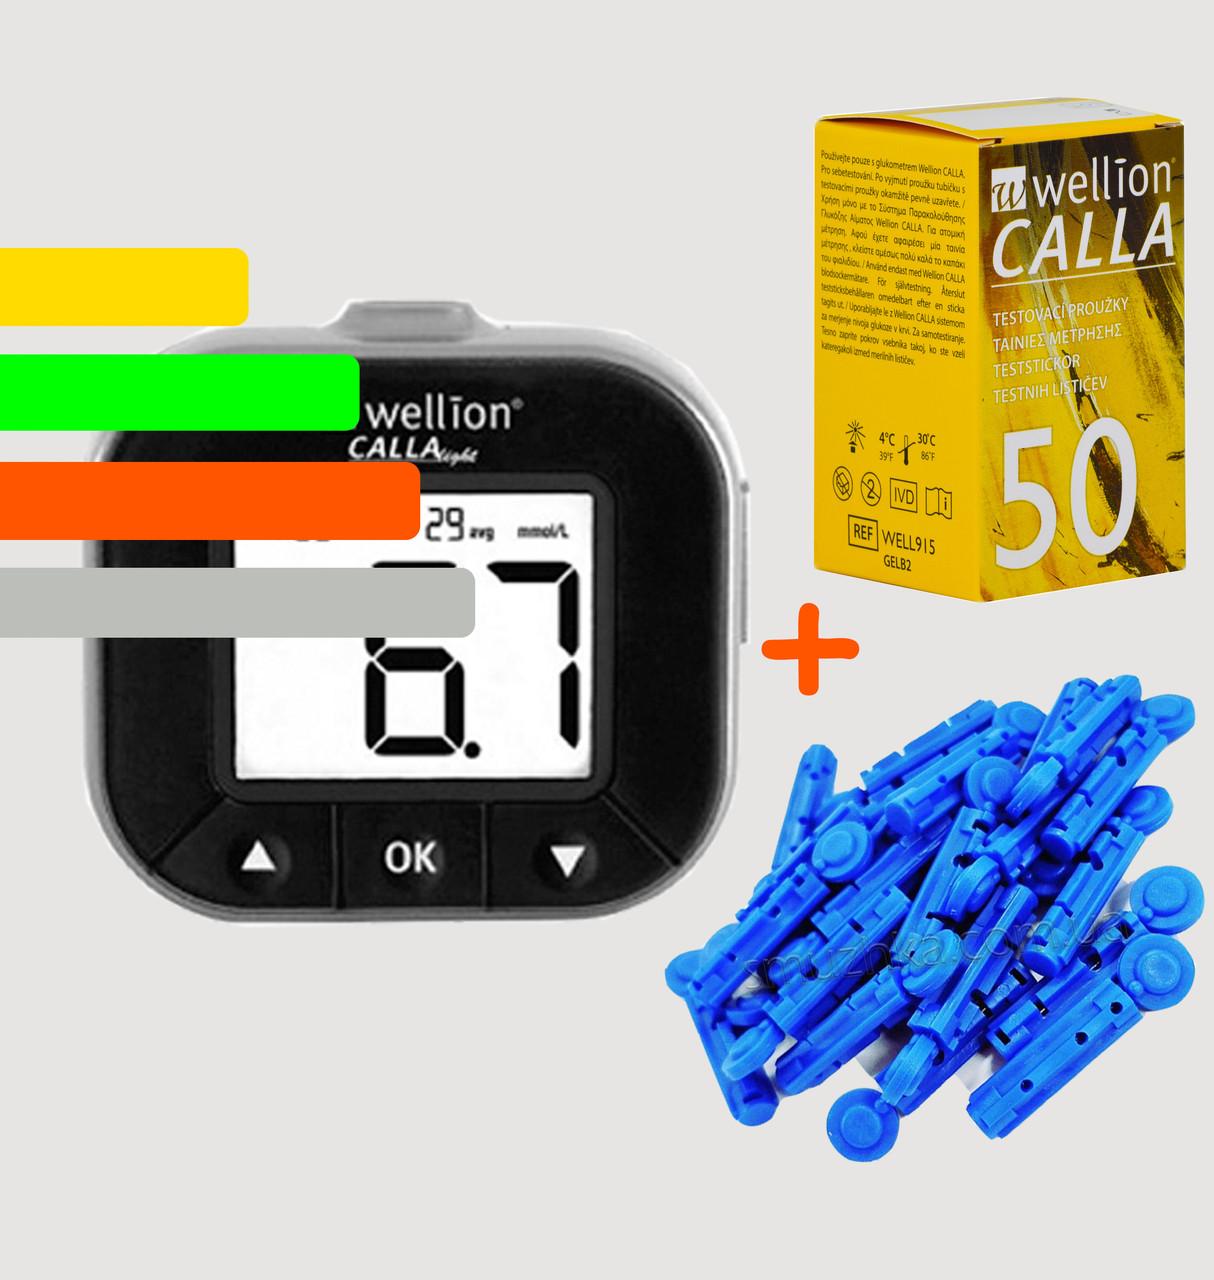 Глюкометр Wellion CALLA - Веллион Калла+50 тест-полосок+50 ланцетов